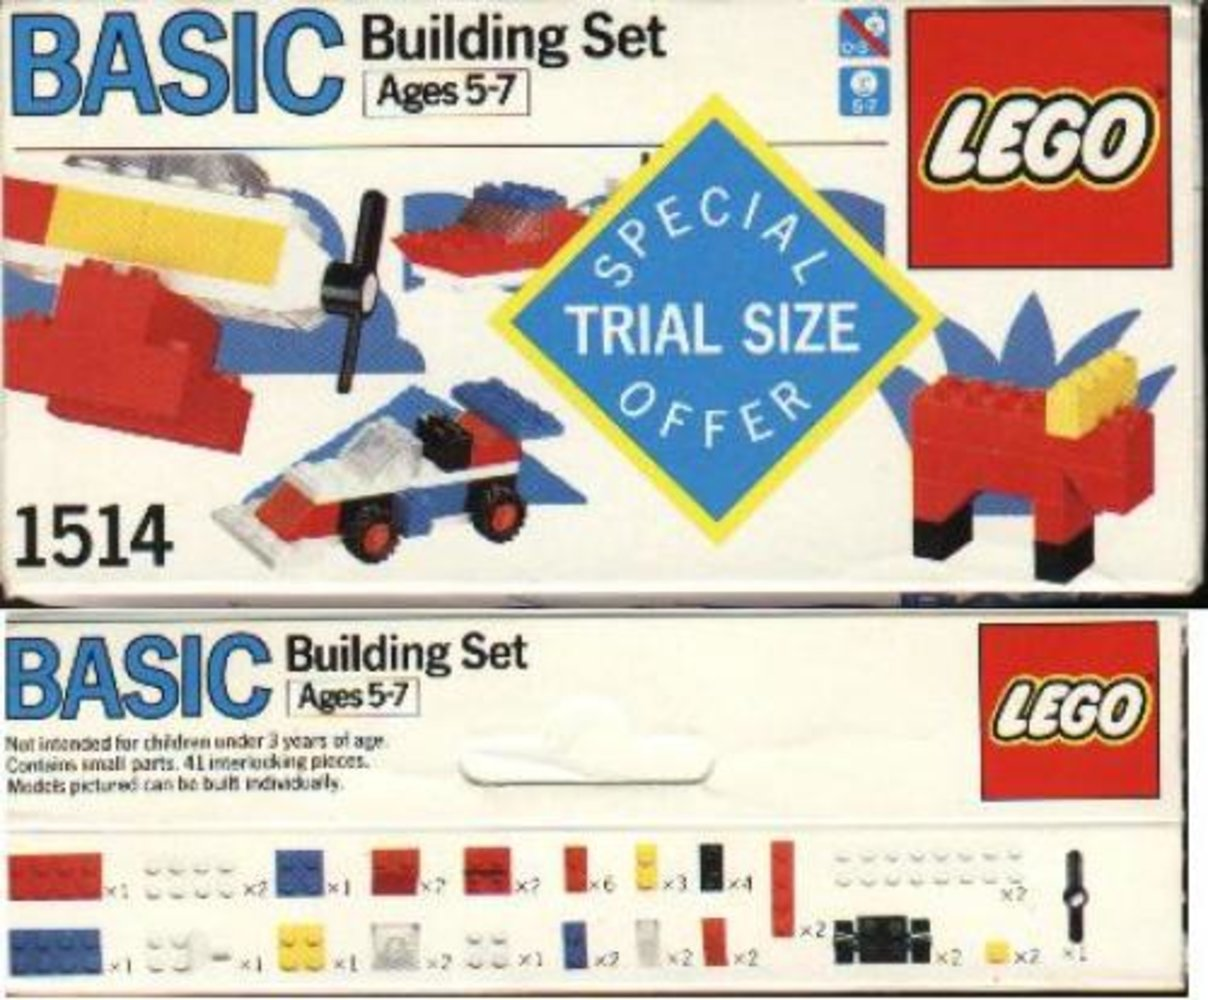 Basic Building Set Trial Size